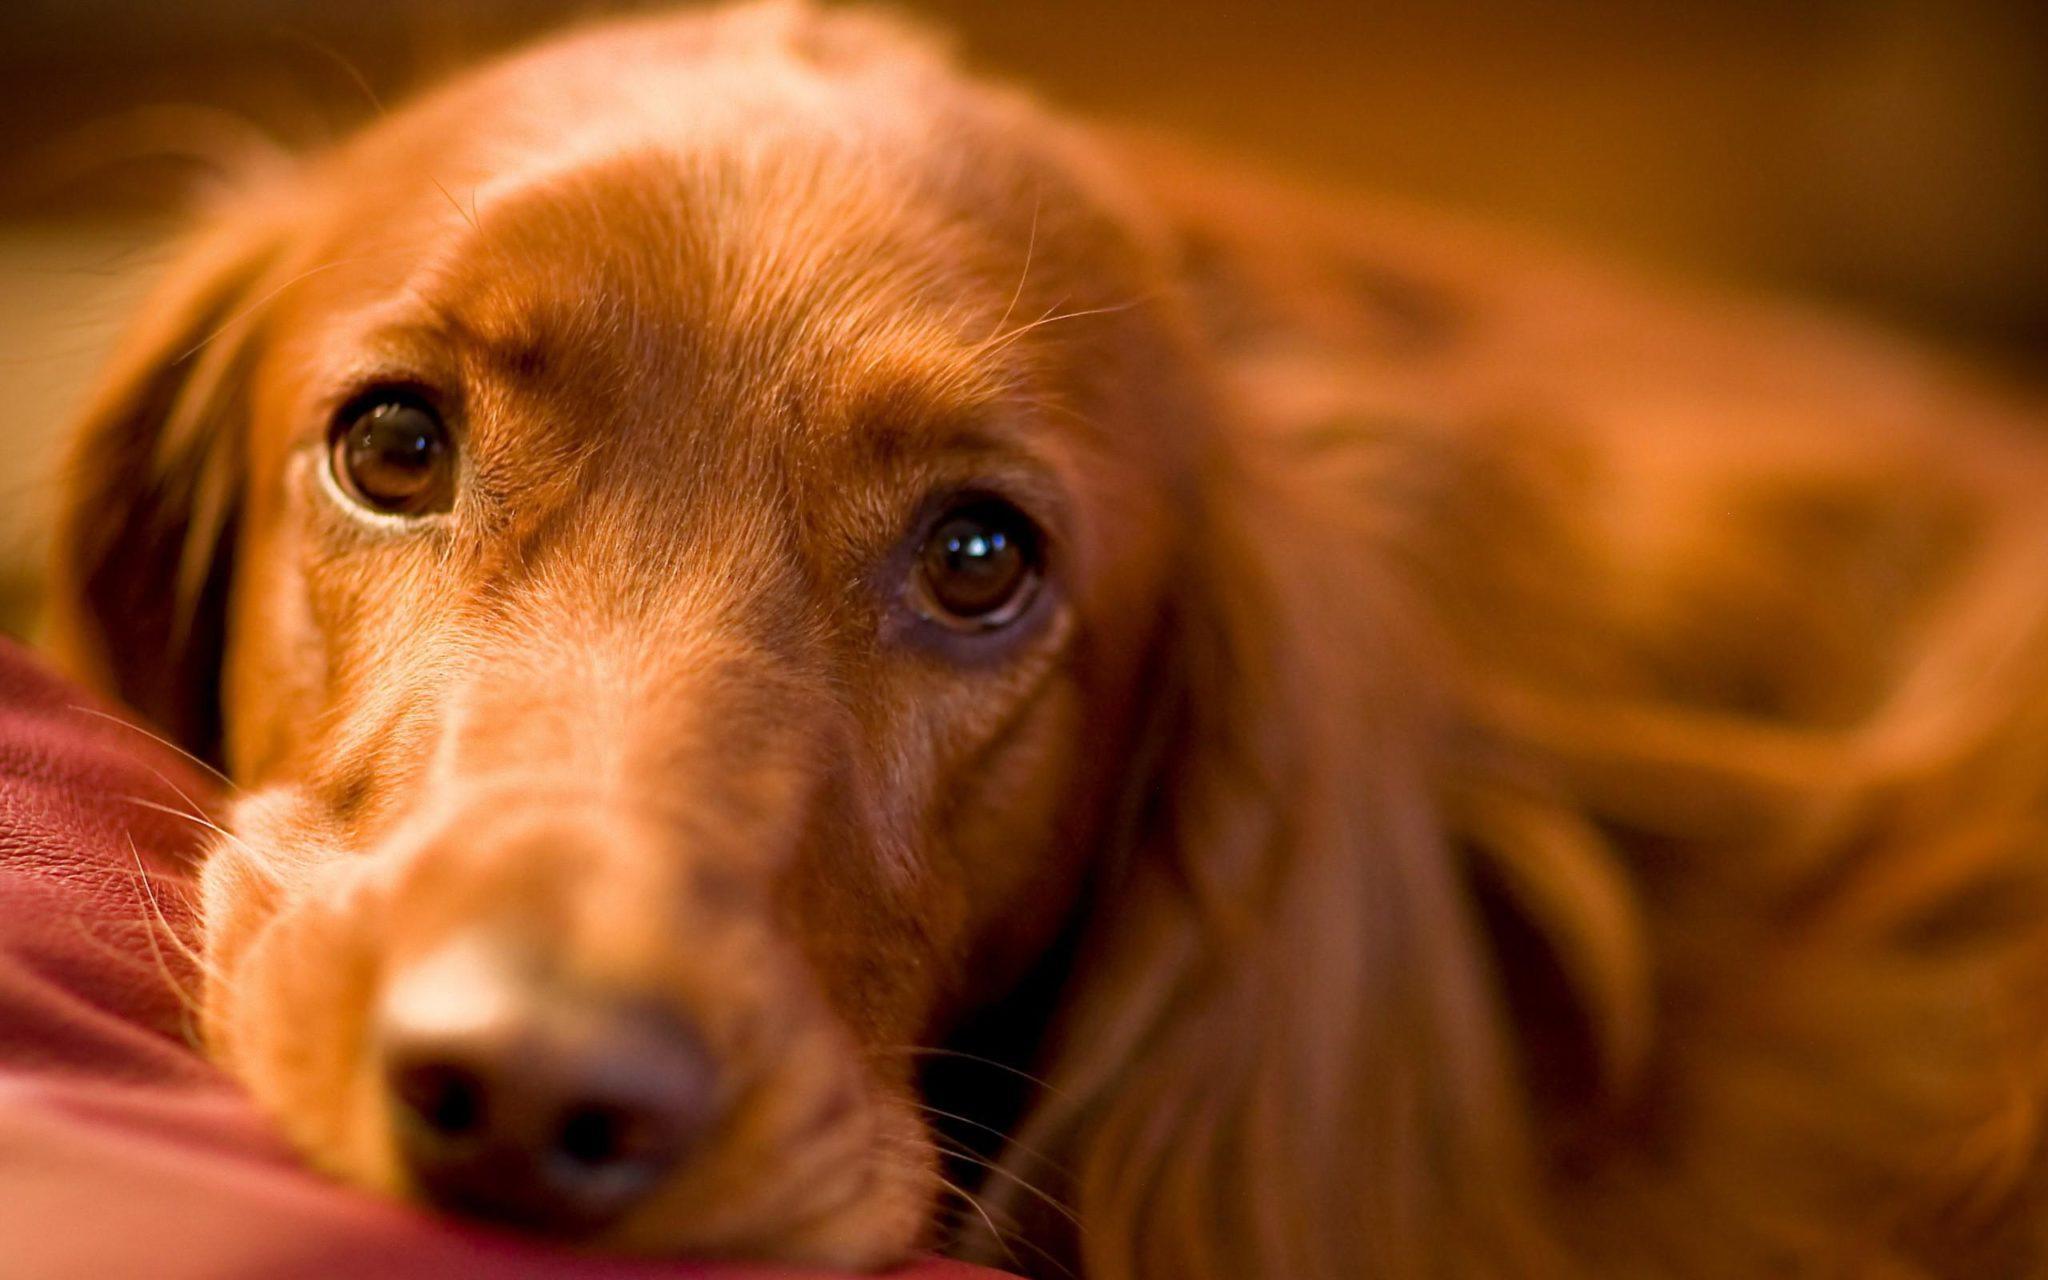 http://www.kopekegitimi.gen.tr/wp-content/uploads/2016/05/sweet_irish_dog_eyes_pictures.jpg